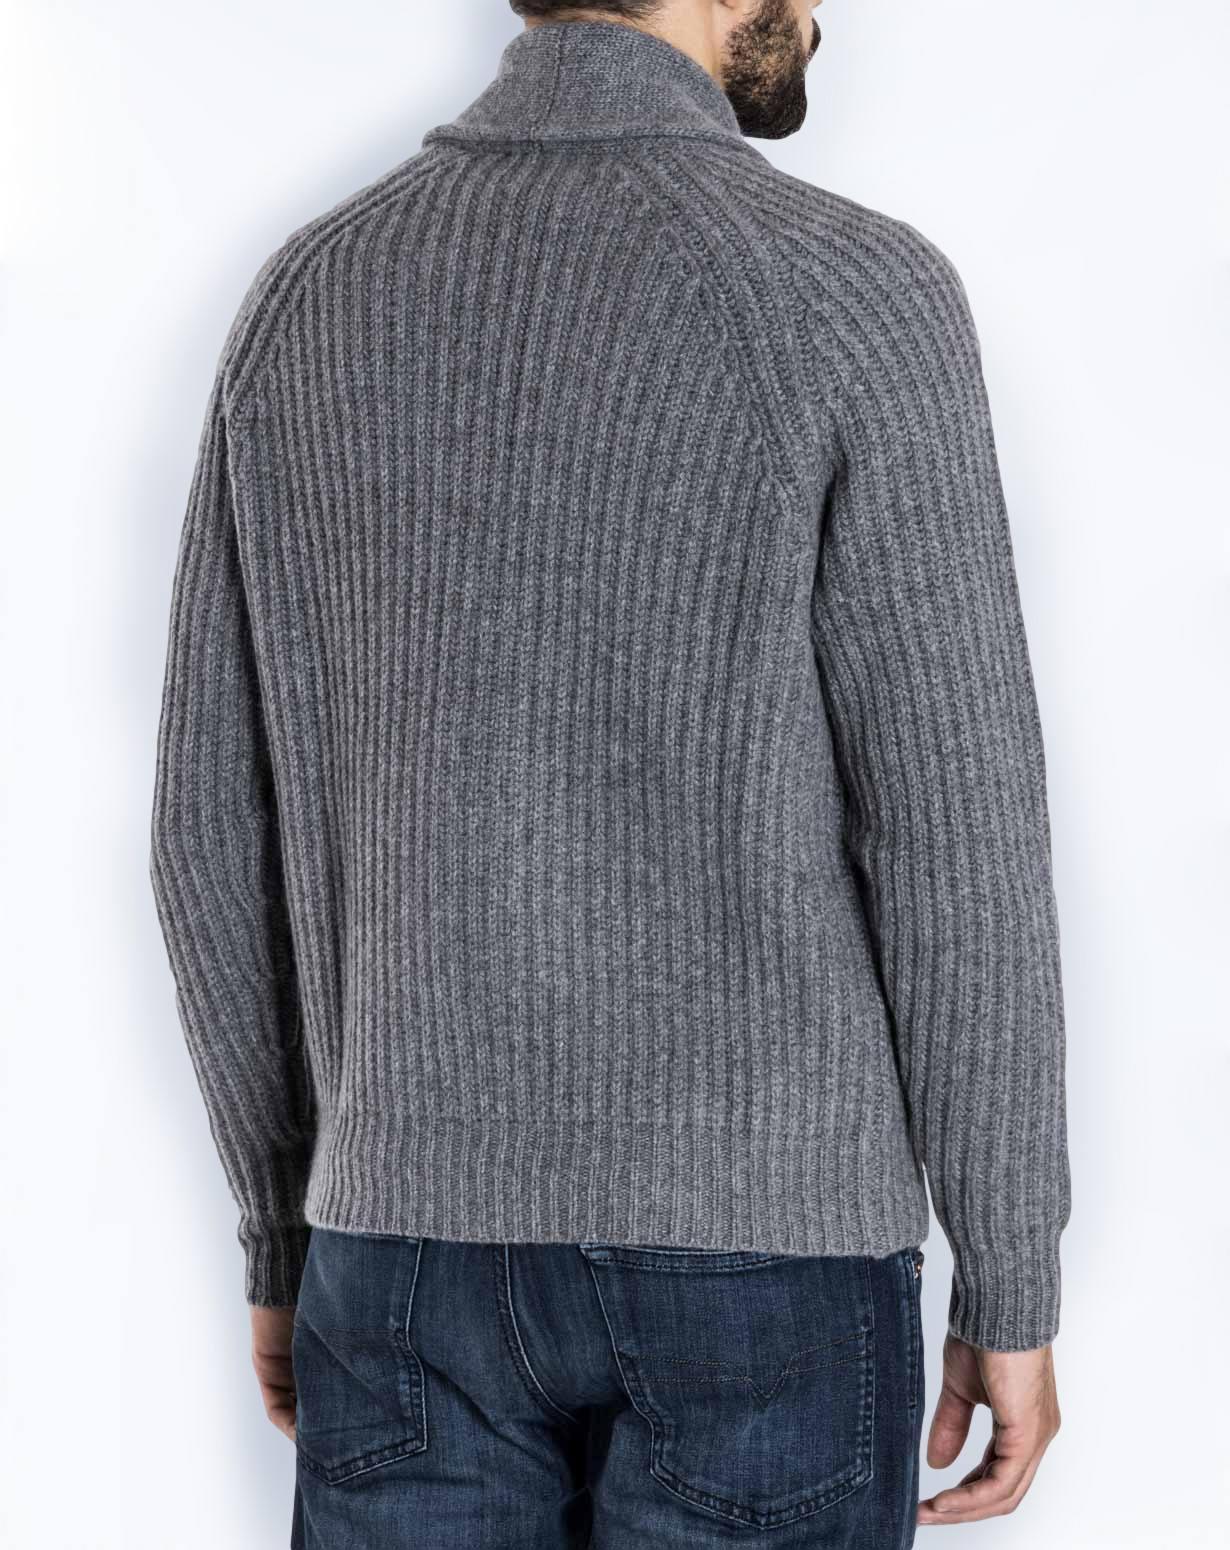 55a0d40407 Cardigan Uomo Coste Inglesi in 100% Cashmere